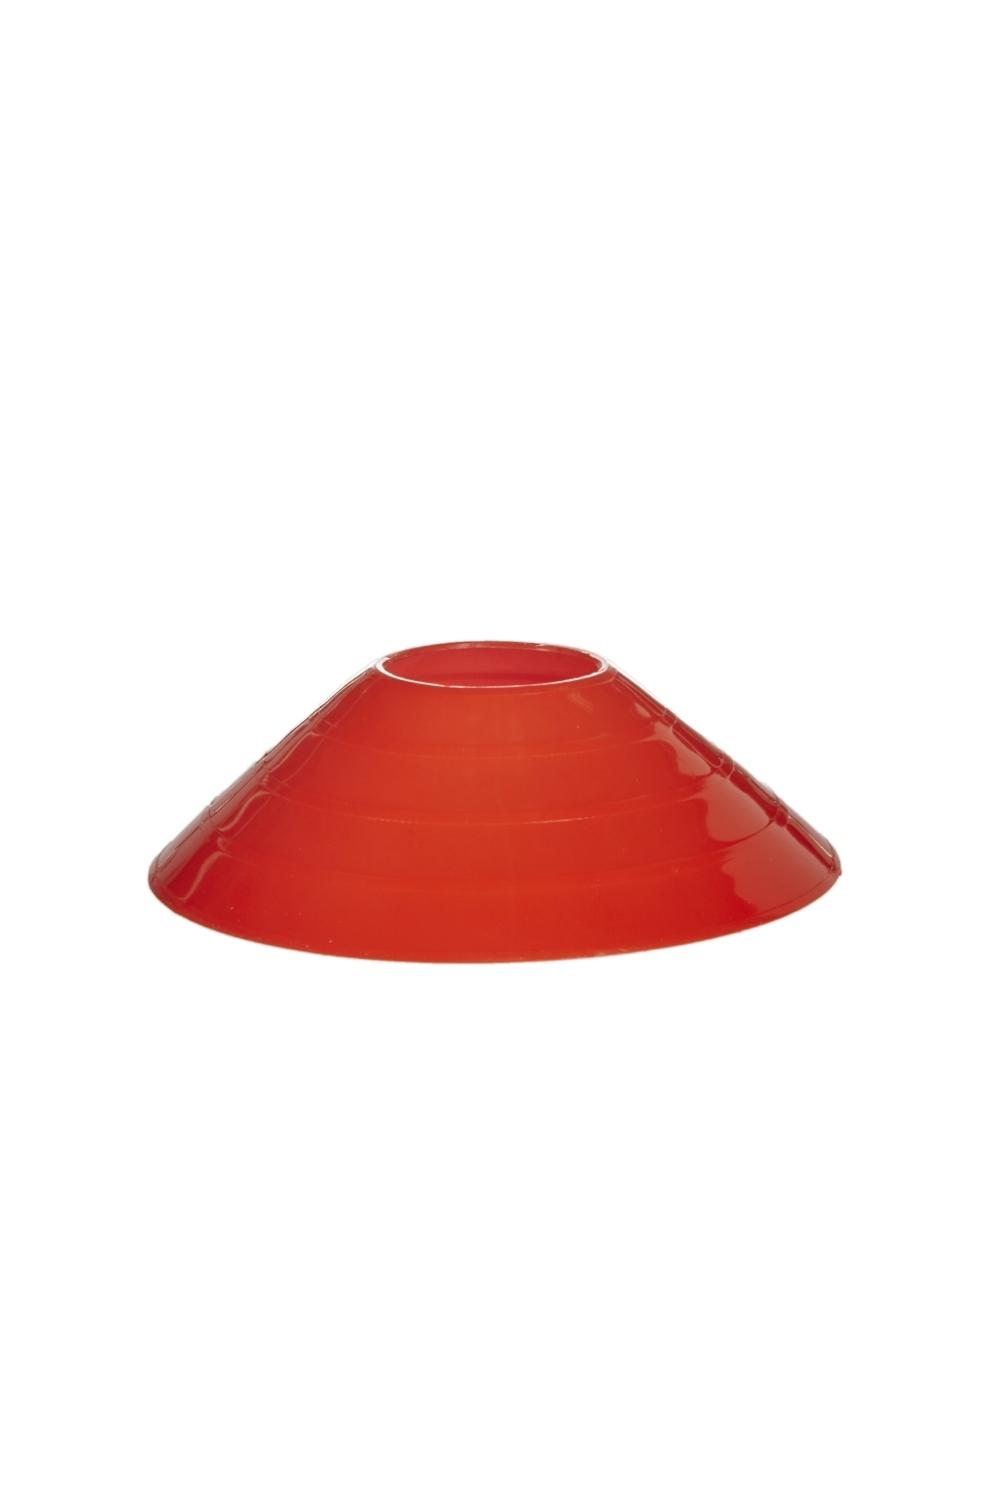 Soccer Cone Red.jpg